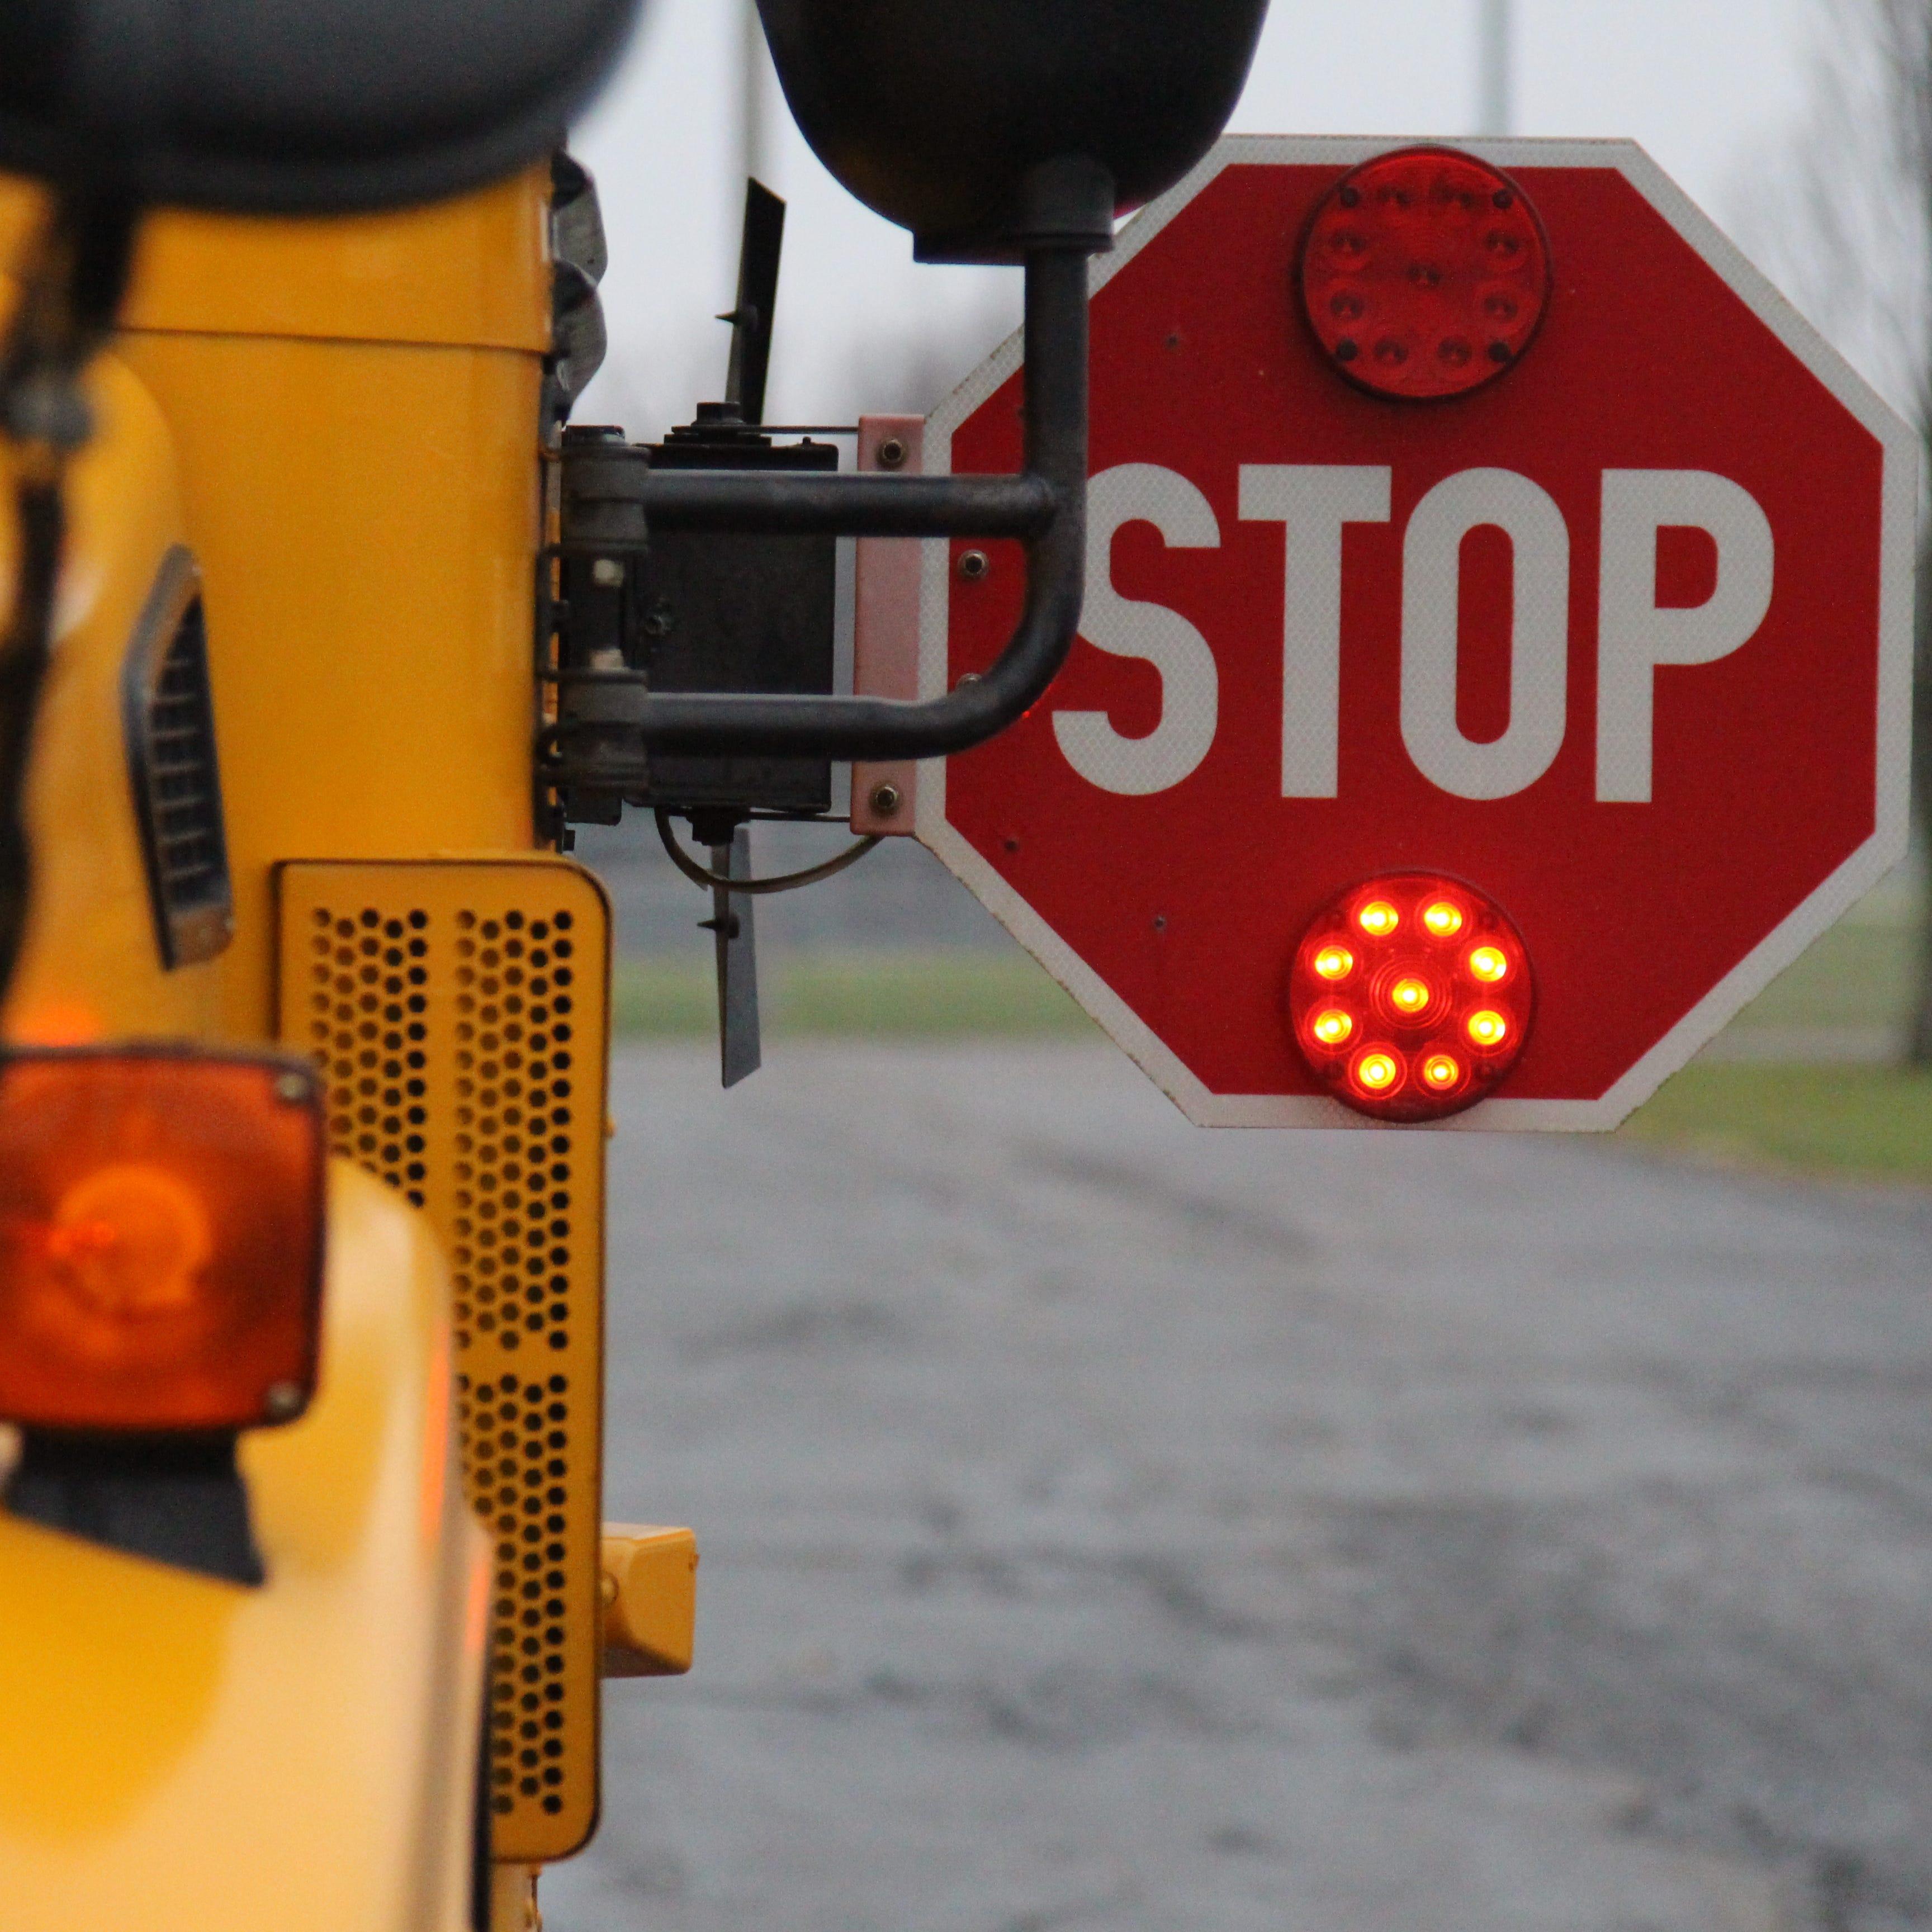 Bus cameras a 'no-brainer' for school districts seeking to catch violators